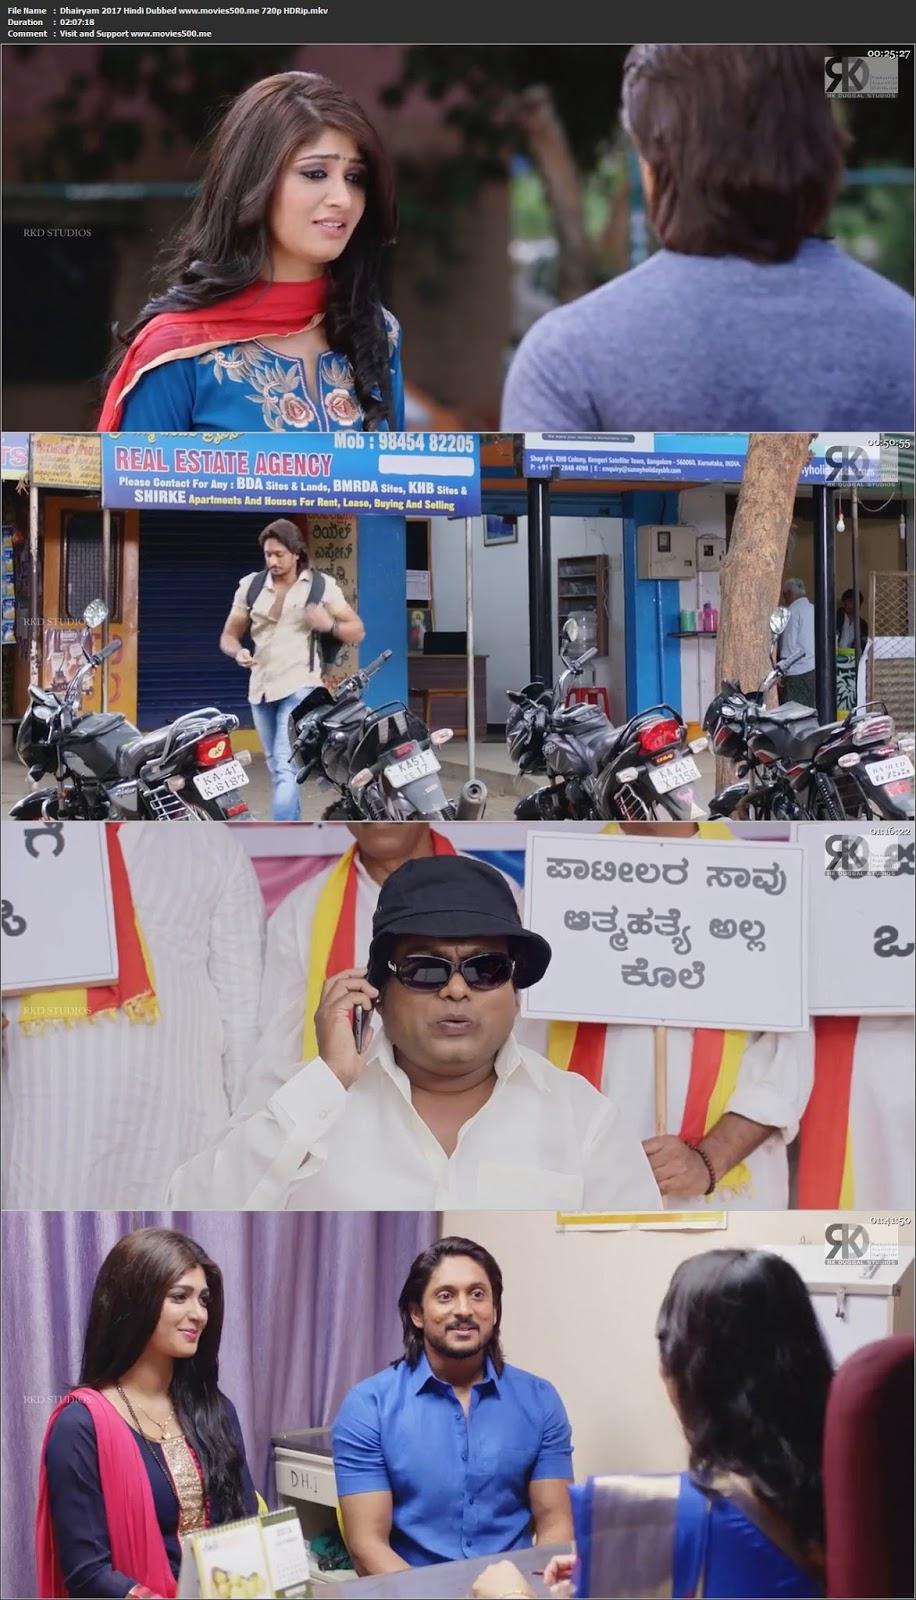 Dhairyam 2017 Hindi Dubbed Full Movie HDRip 720p at teelaunch.co.uk